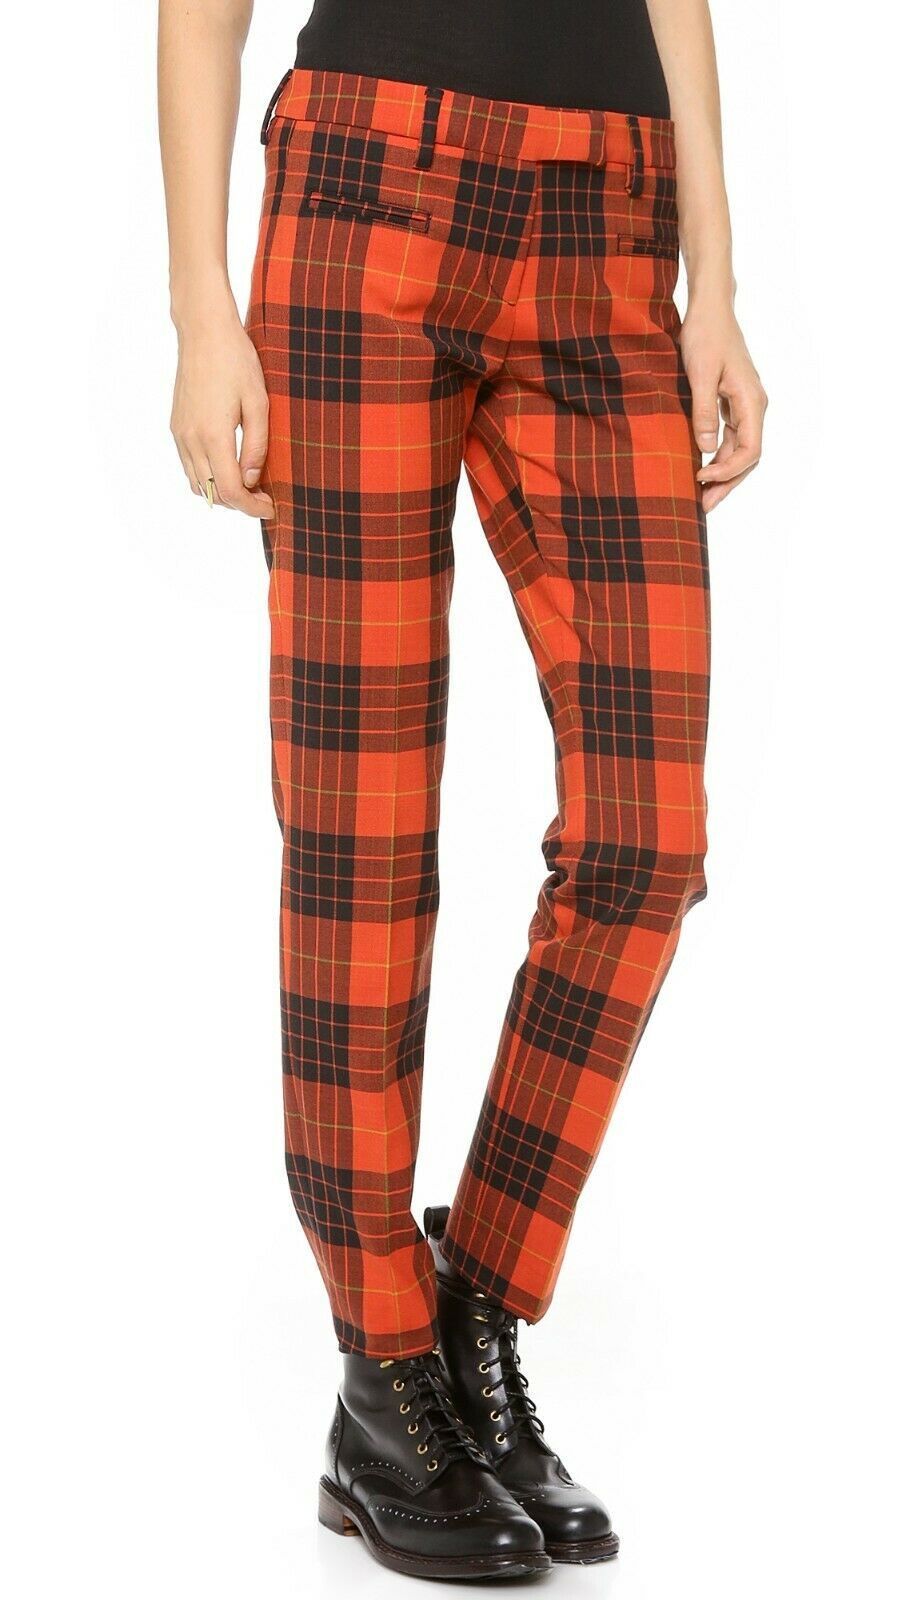 True Royal Tartan Plaid Wool Pants BNWT